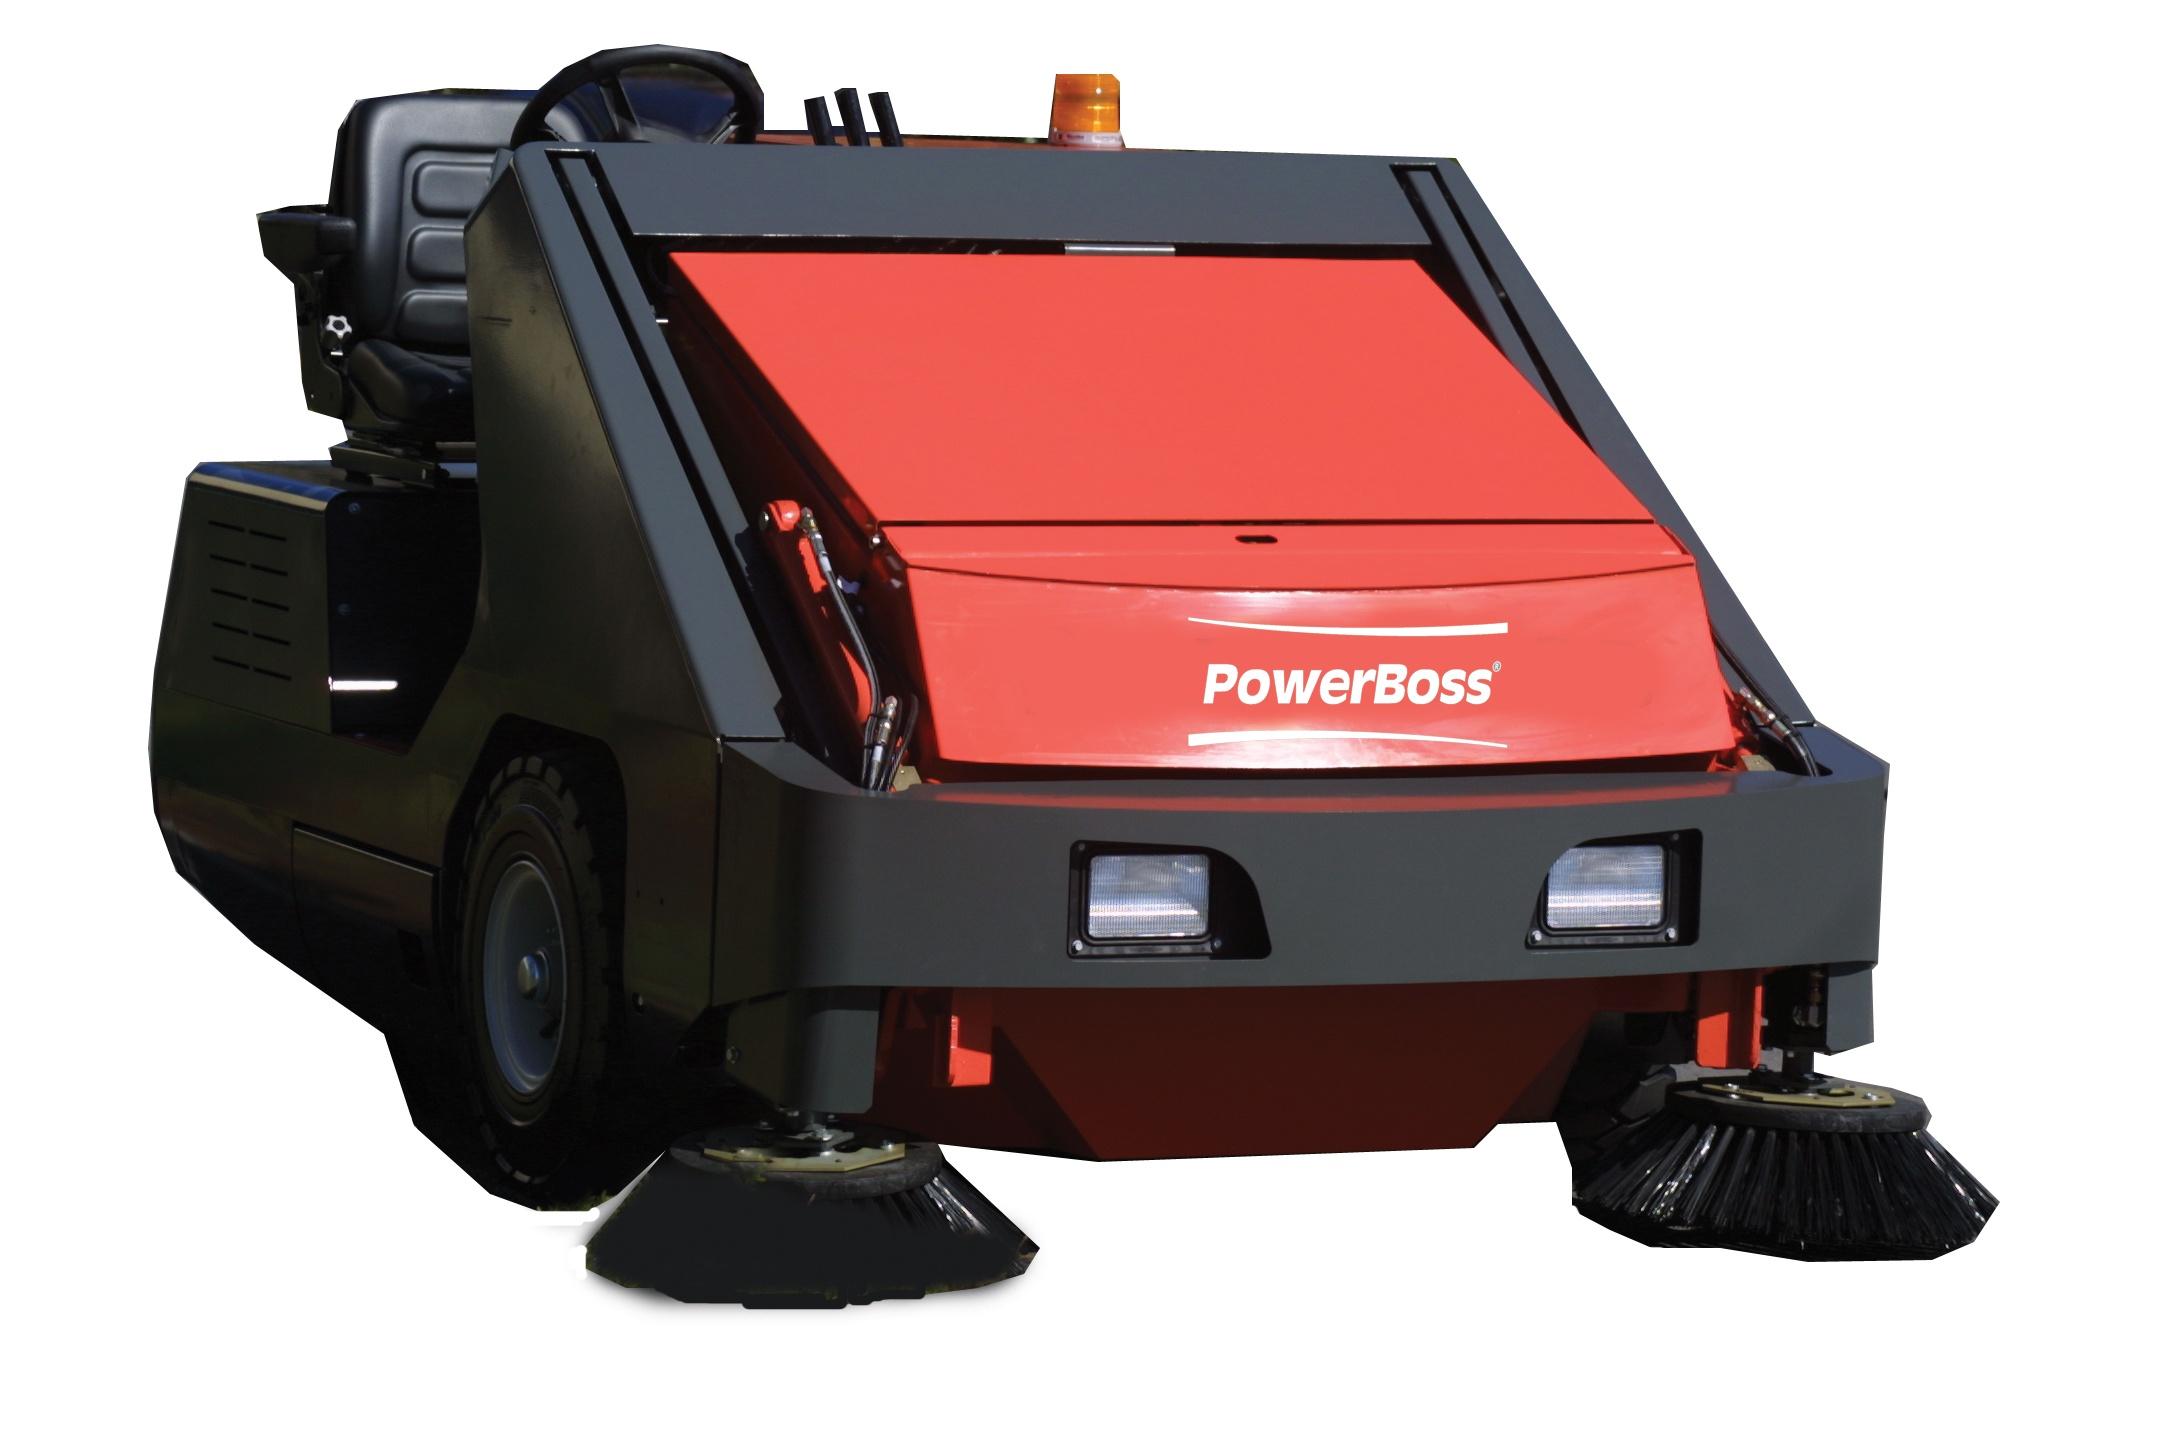 Powerboss 10x Industrial Floor Sweeper Large